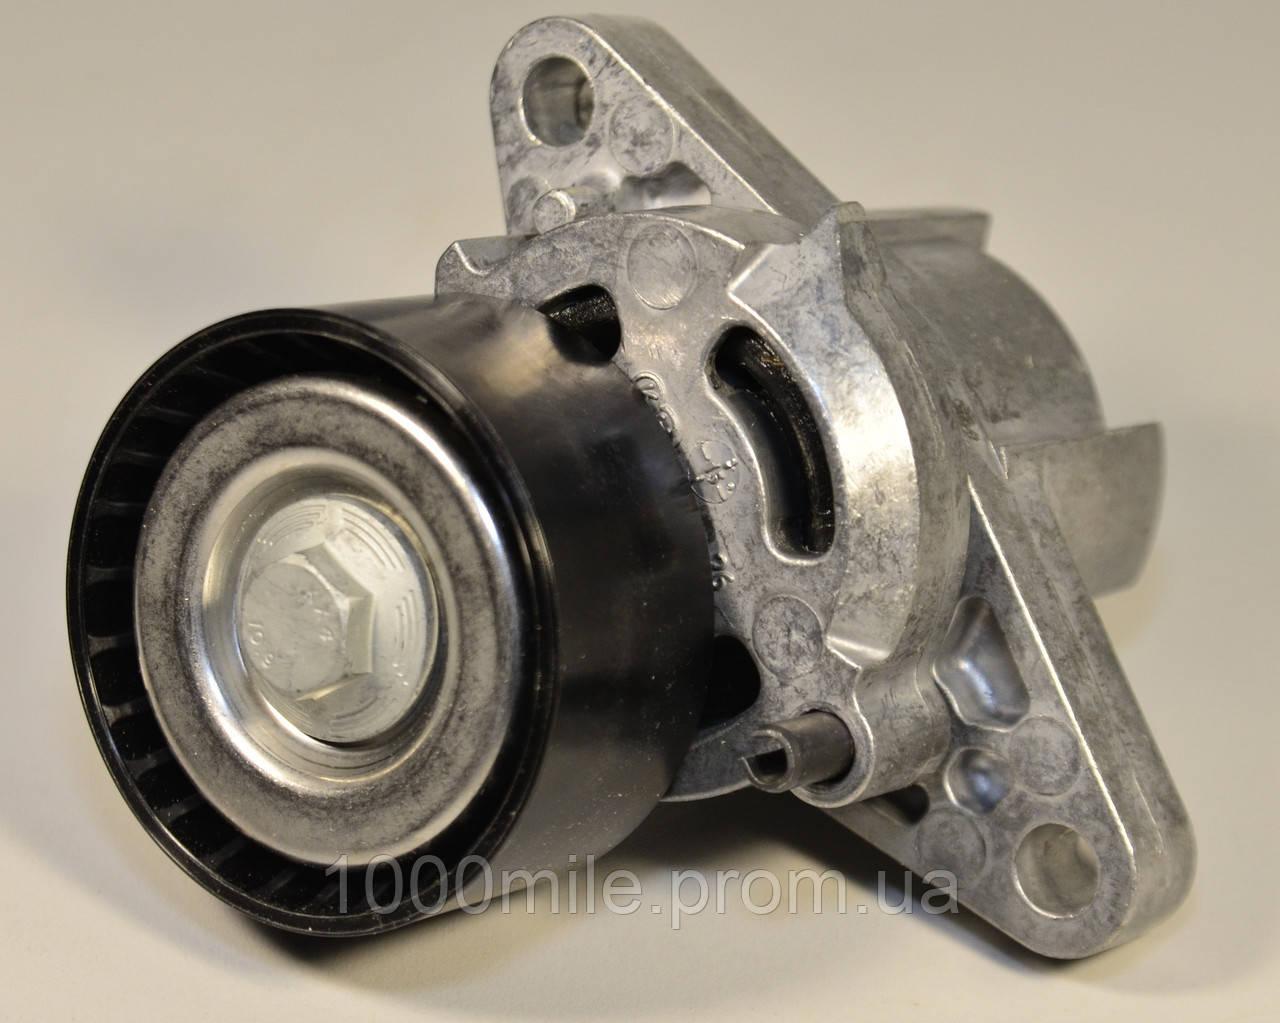 Натяжитель ремня генератора (+АС) на Renault Kangoo 1997->2008  1.4i, 1.6і 16V — Renault -  8200603359